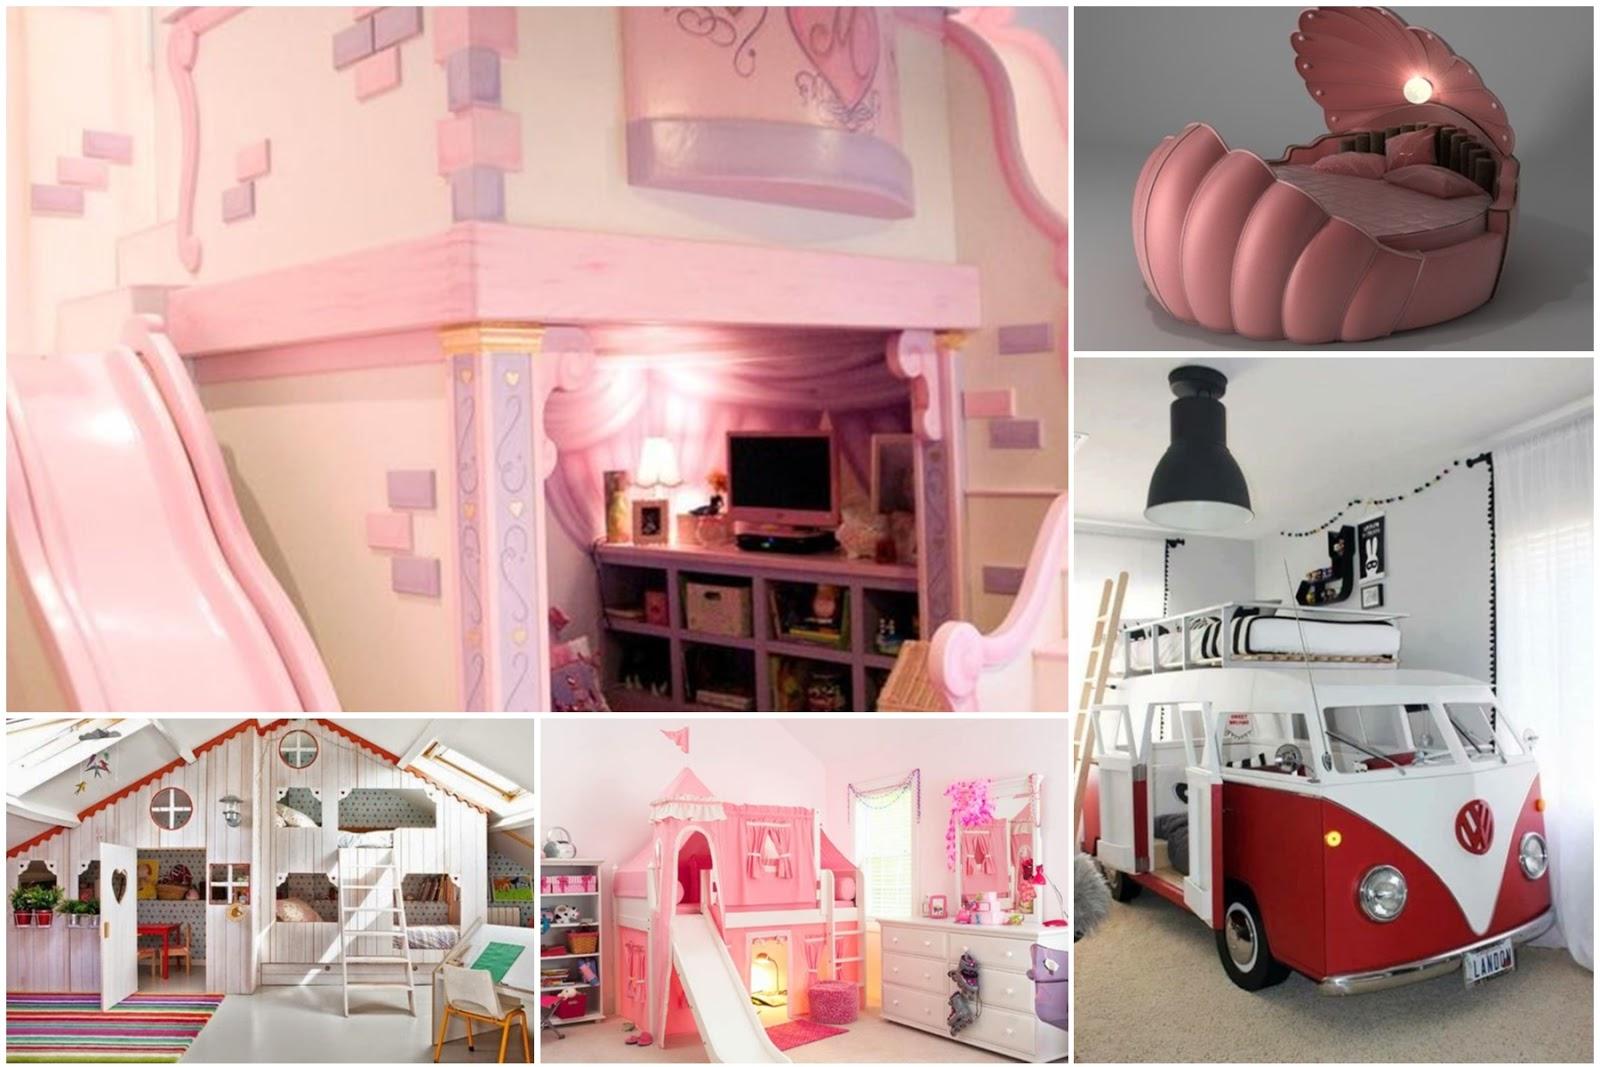 Baby Crib Design And Ideas Interior4Design